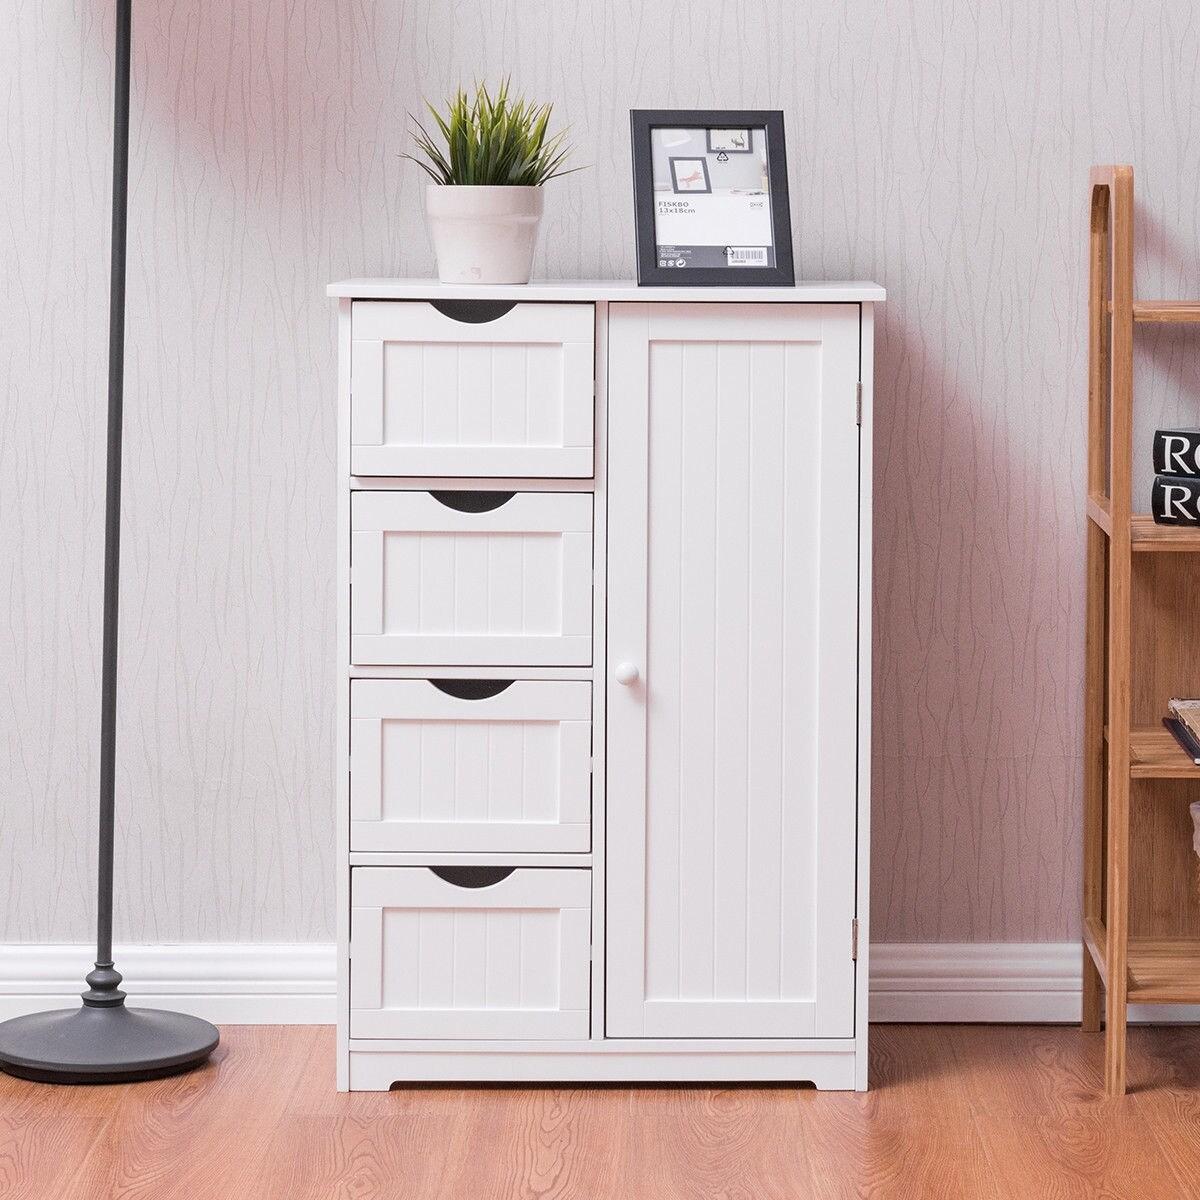 Bathroom Storage Cabinets With Doors - Interior Design 3d •